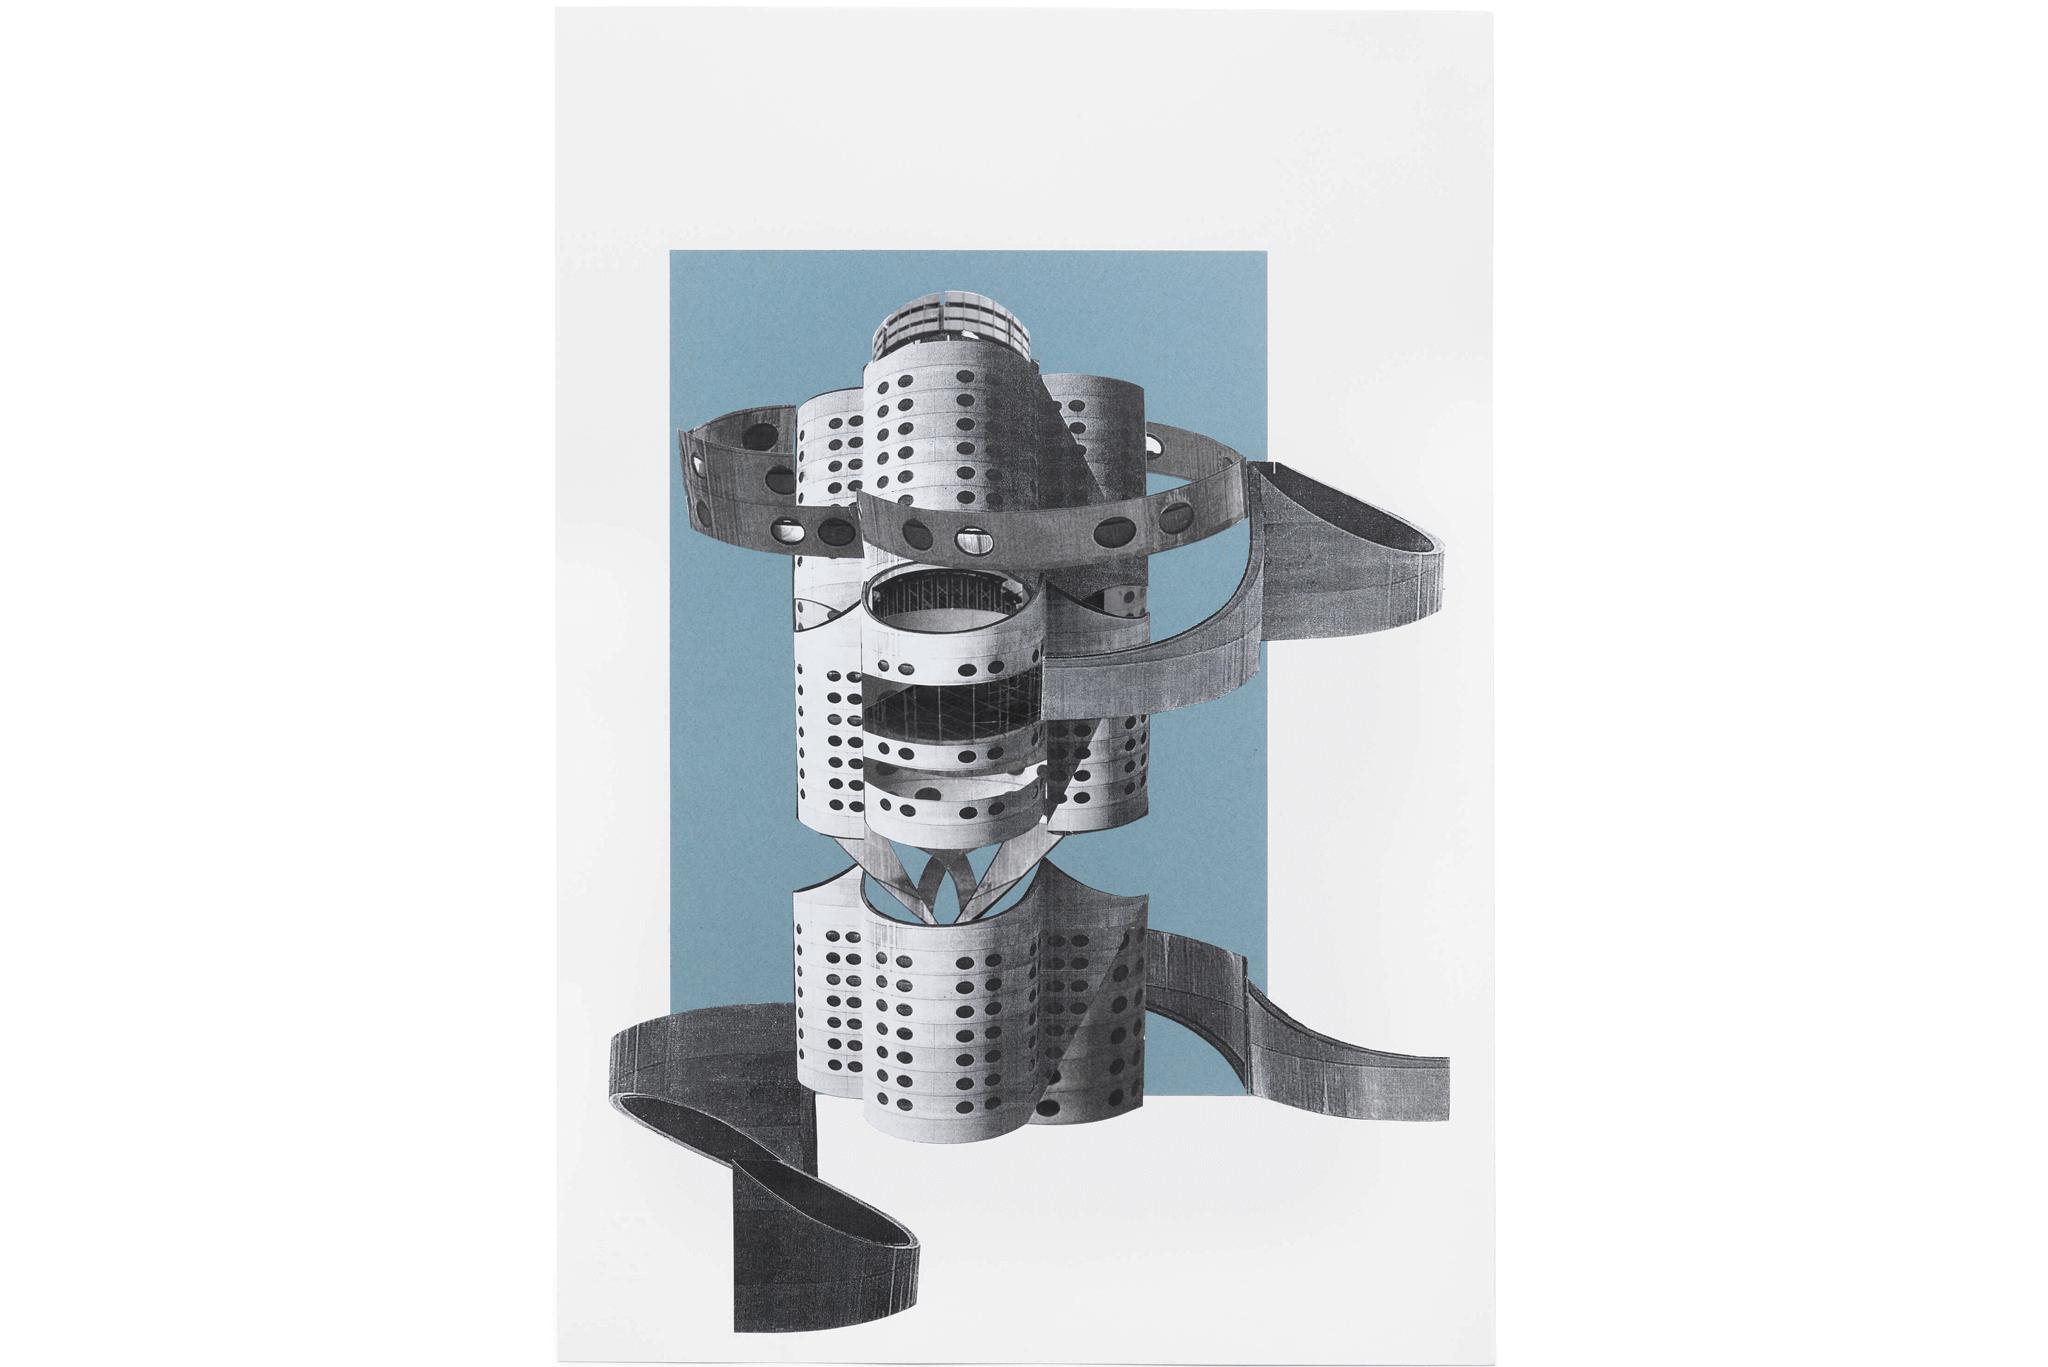 2015_08_Frauke-Dannert_Collage_Papiercollage_Ribbon-Kopie